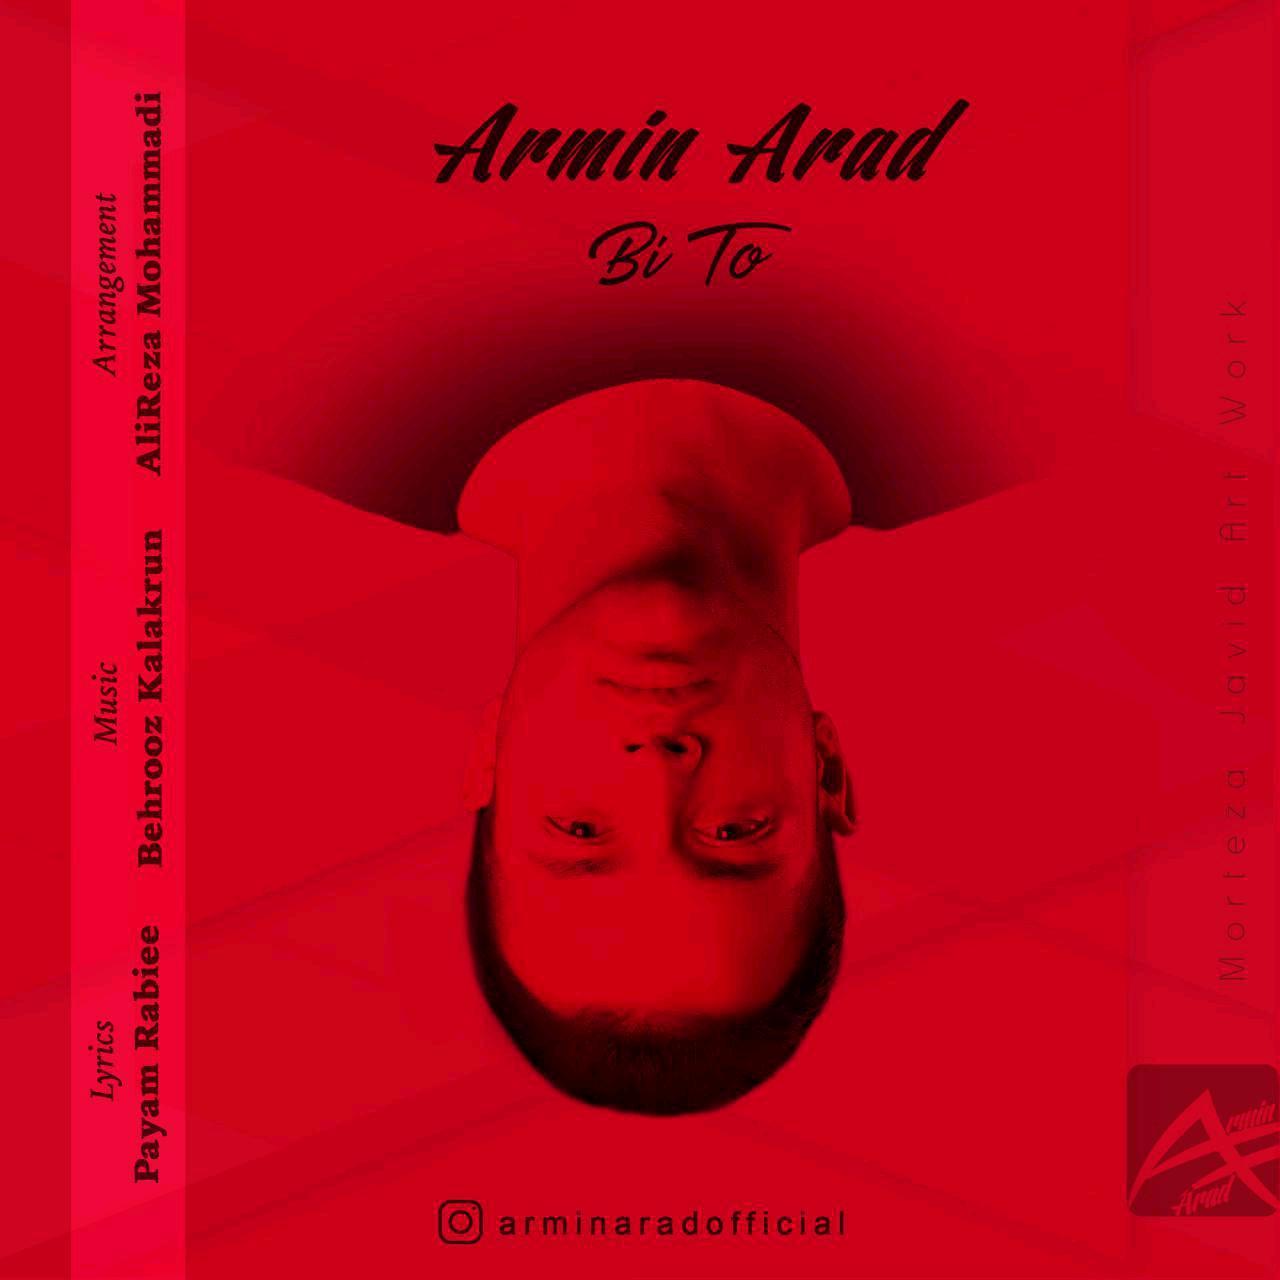 Armin Arad – Bi To